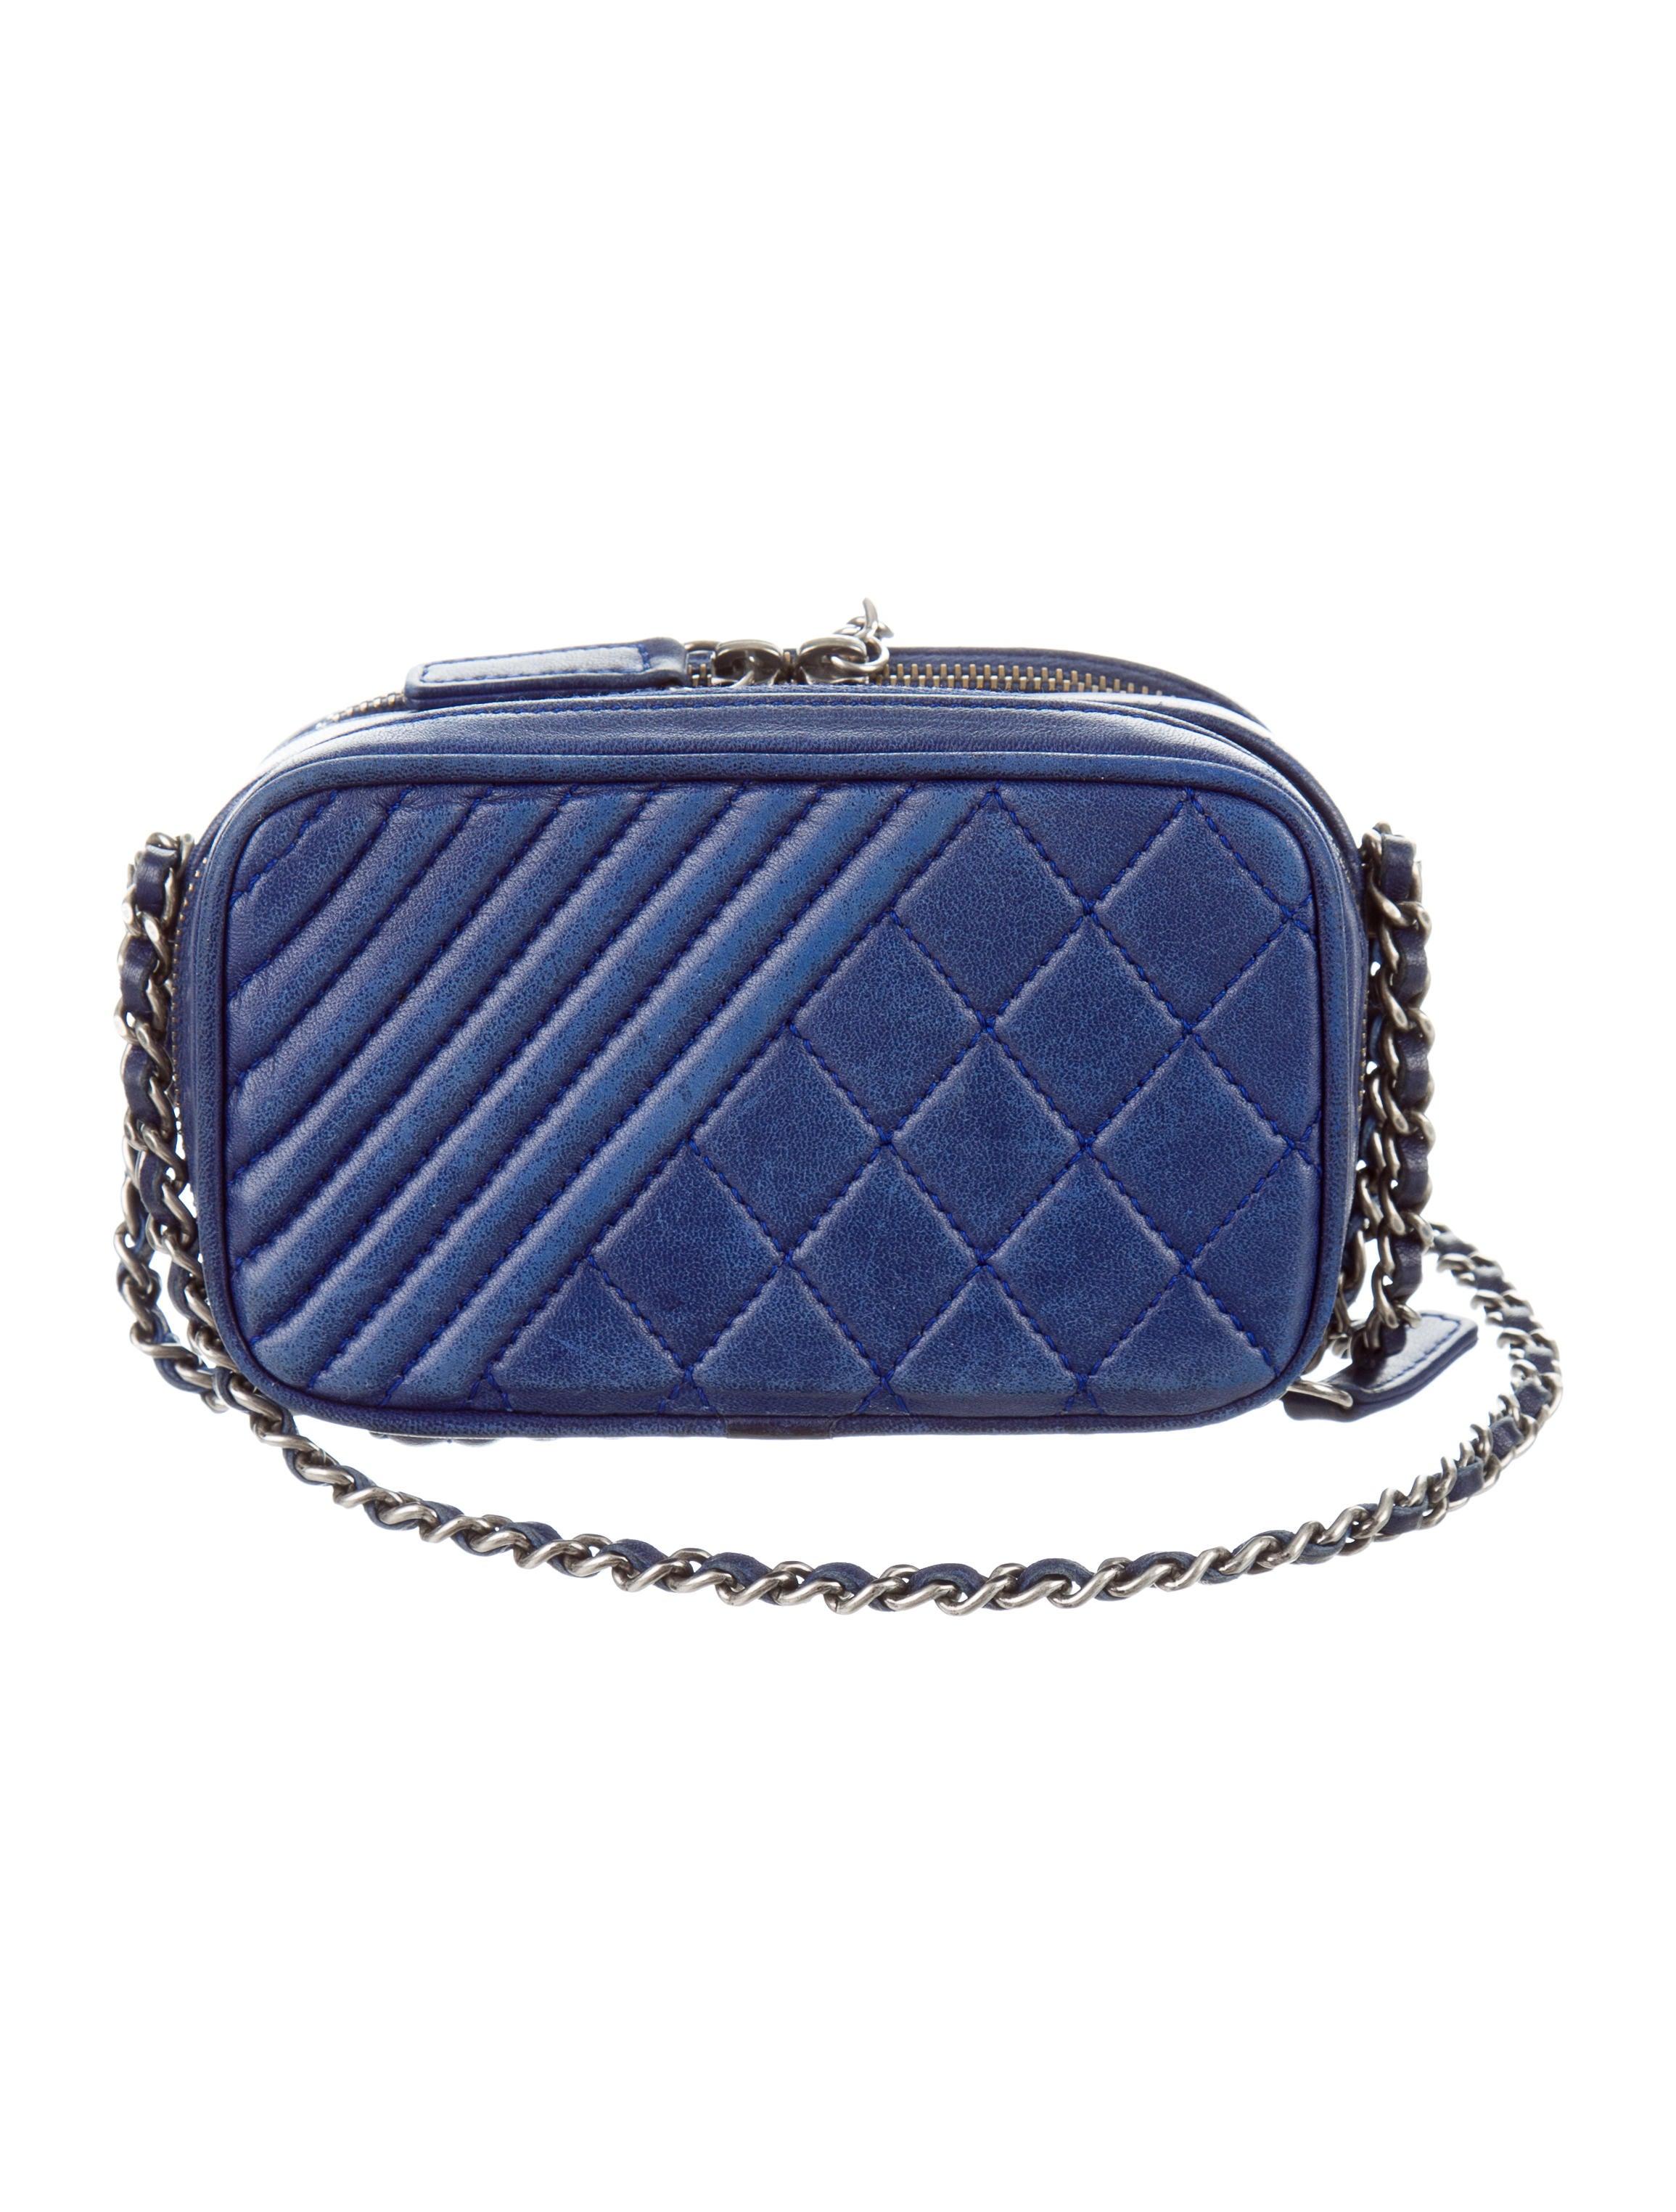 Chanel Mini Coco Boy Camera Crossbody Bag Handbags